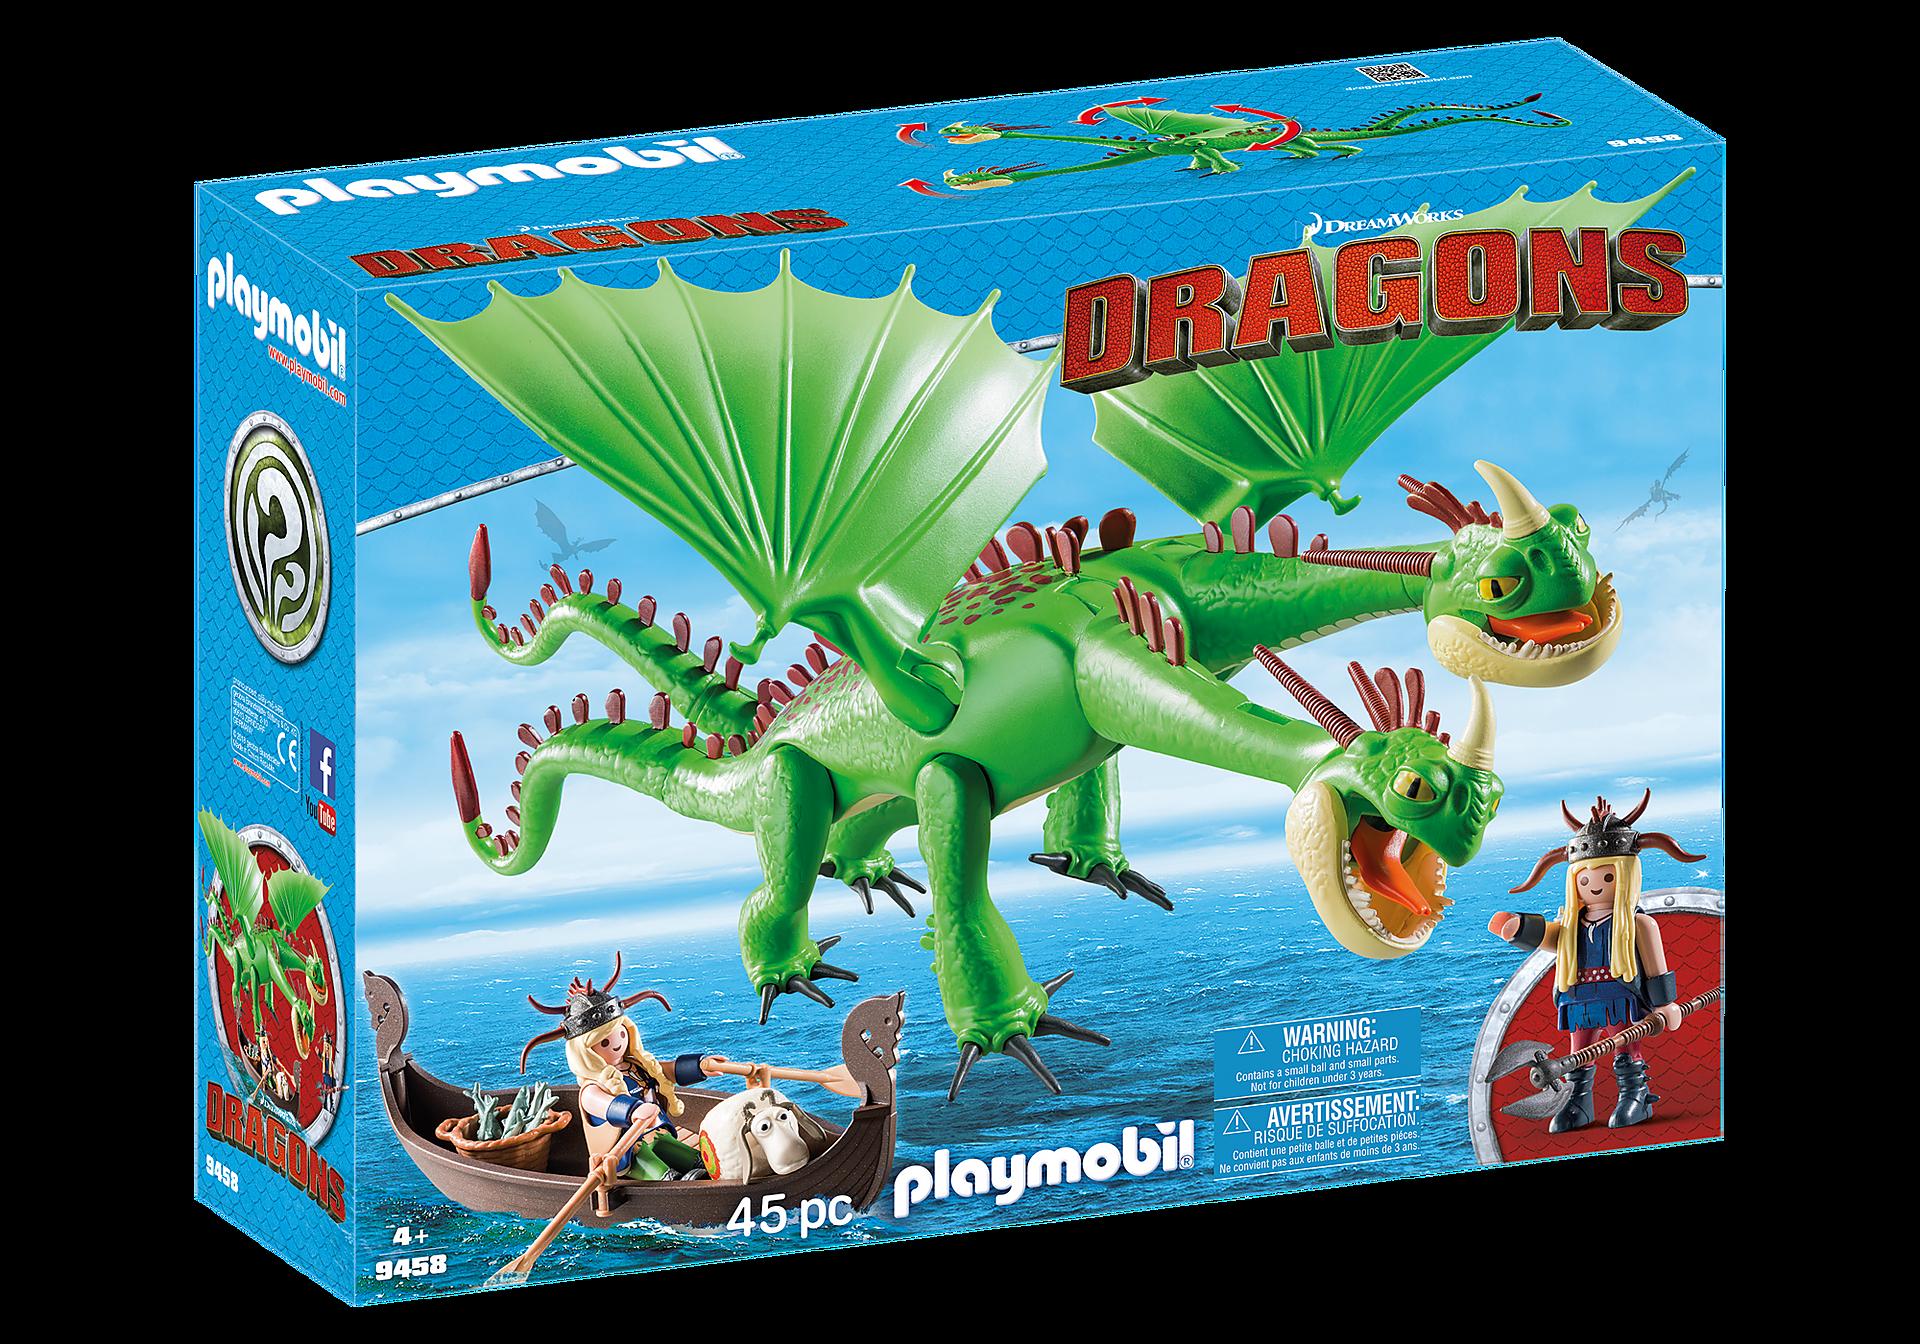 http://media.playmobil.com/i/playmobil/9458_product_box_front/Ο Πέτρας και η Πέτρα με τον δικέφαλο δράκο Ρέψιμο & Αναγούλα